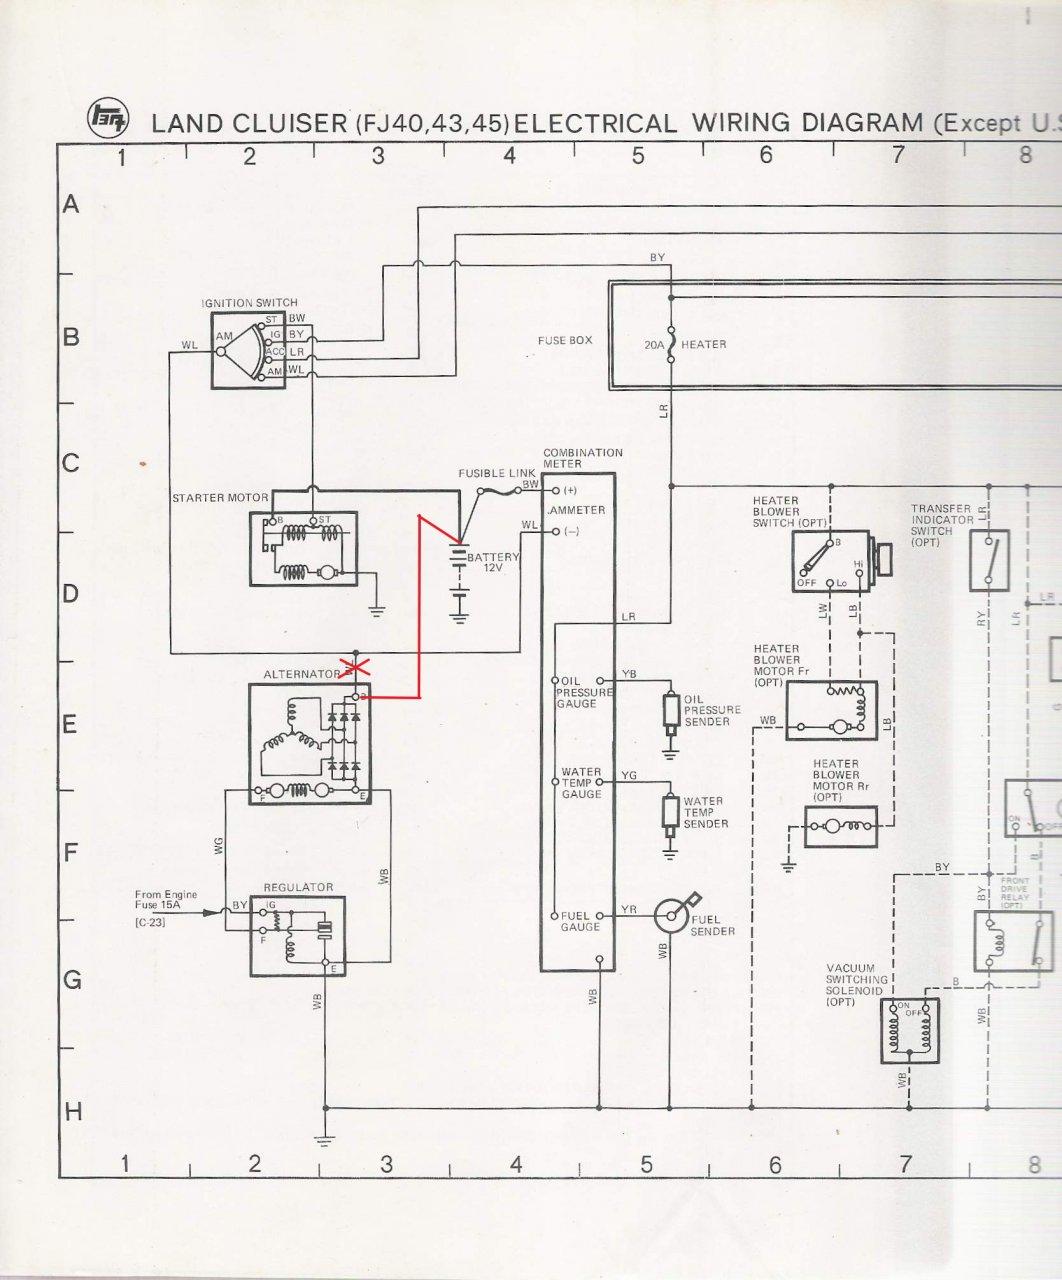 1976 toyota fj40 wiring diagram air conditioning cycle alternator help on 350 swap ih8mud forum